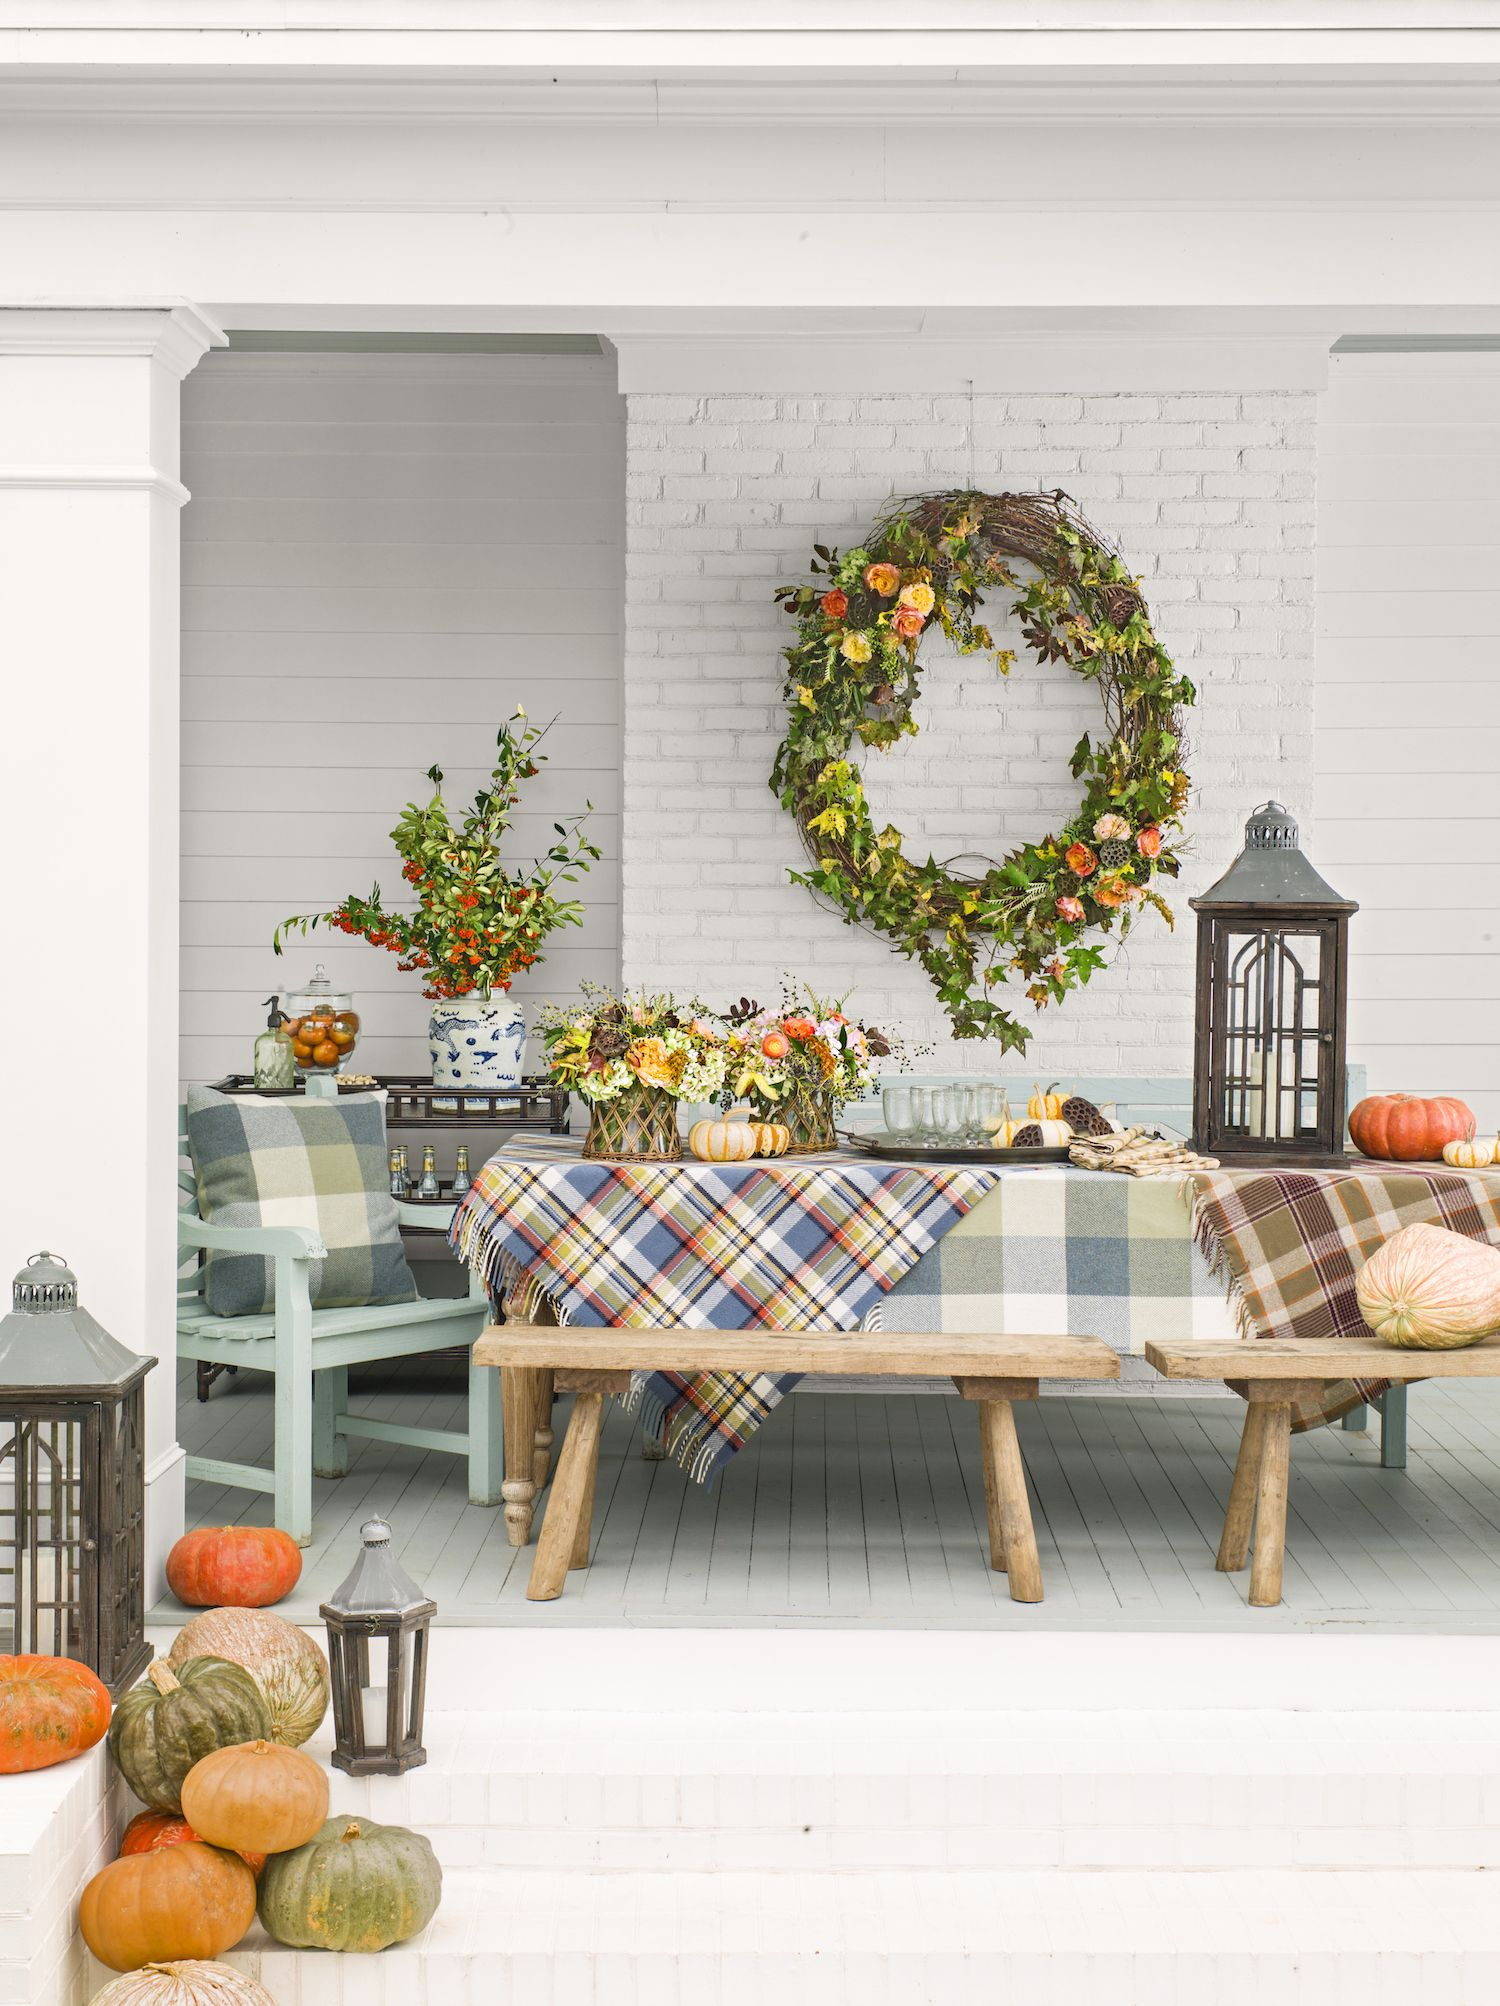 25 Gorgeous Fall Centerpieces Autumn Table Decorations